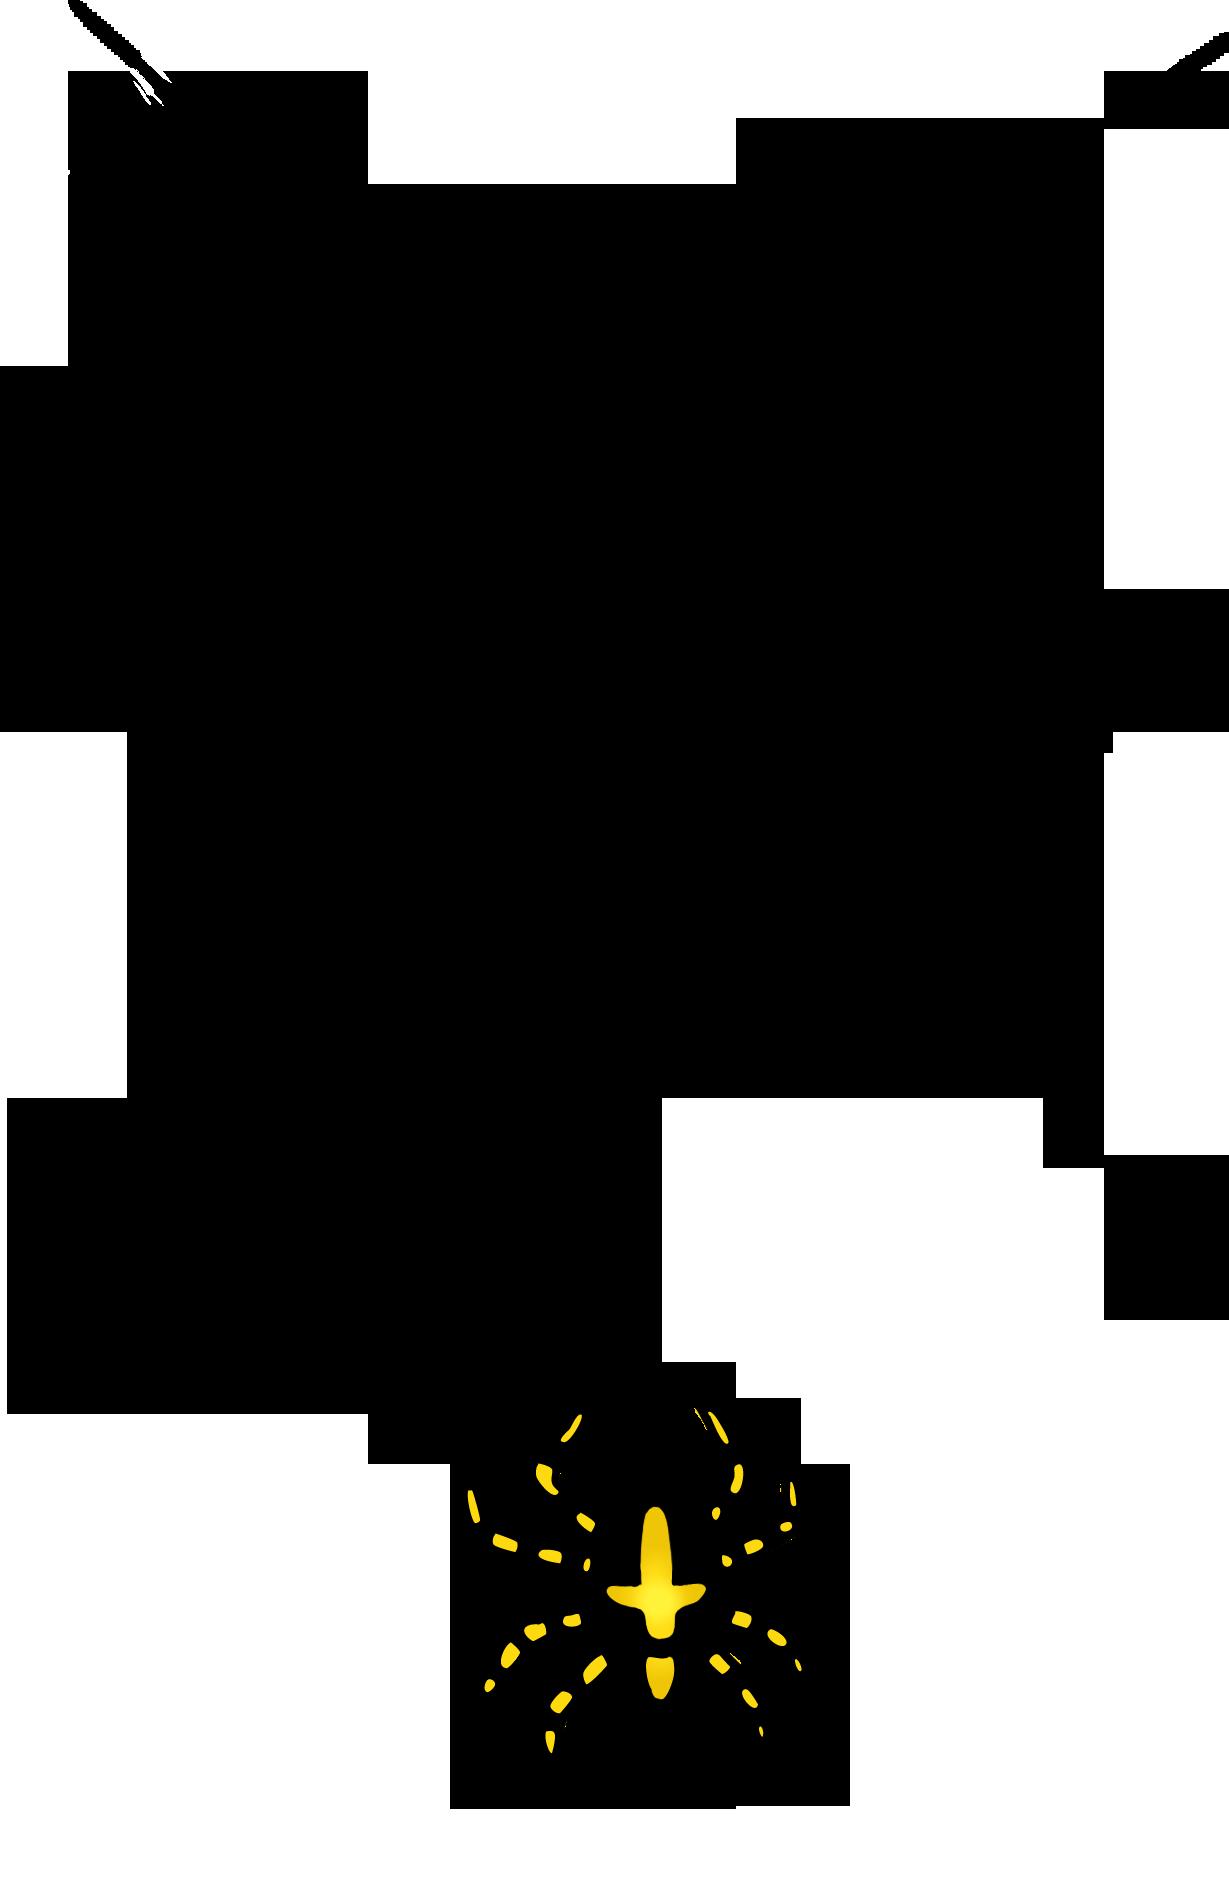 Halloween Spider Web Clipart | Clipart Panda - Free ...